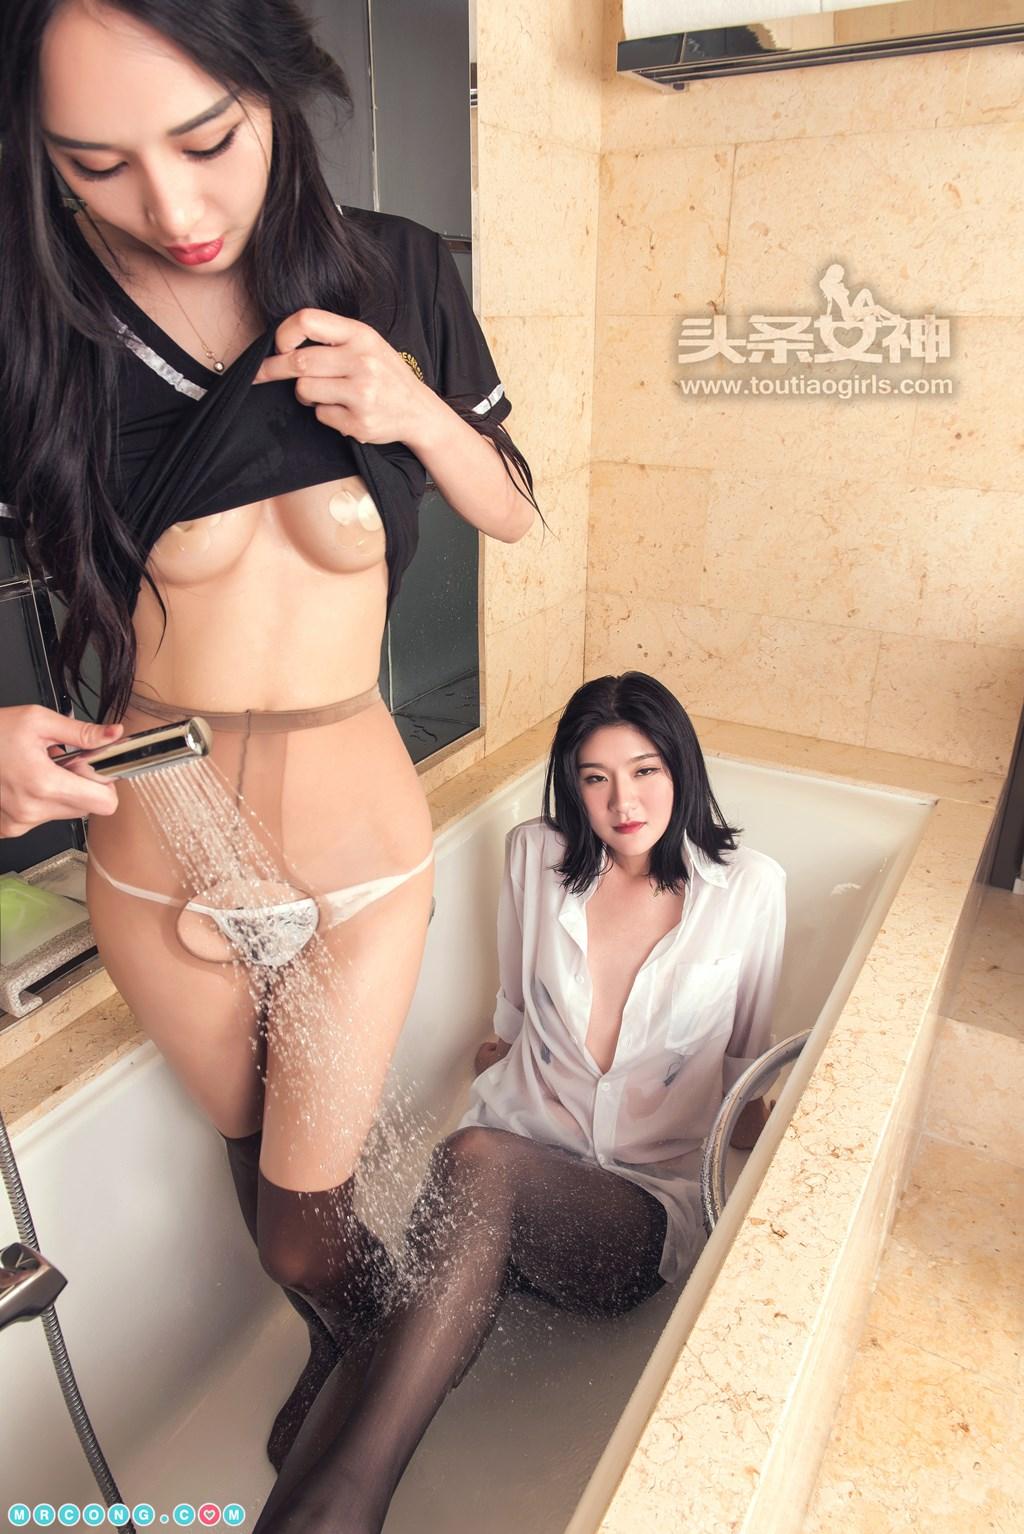 Image TouTiao-2017-10-09-Various-Models-MrCong.com-027 in post TouTiao 2017-10-09: Người mẫu tổng hợp (42 ảnh)